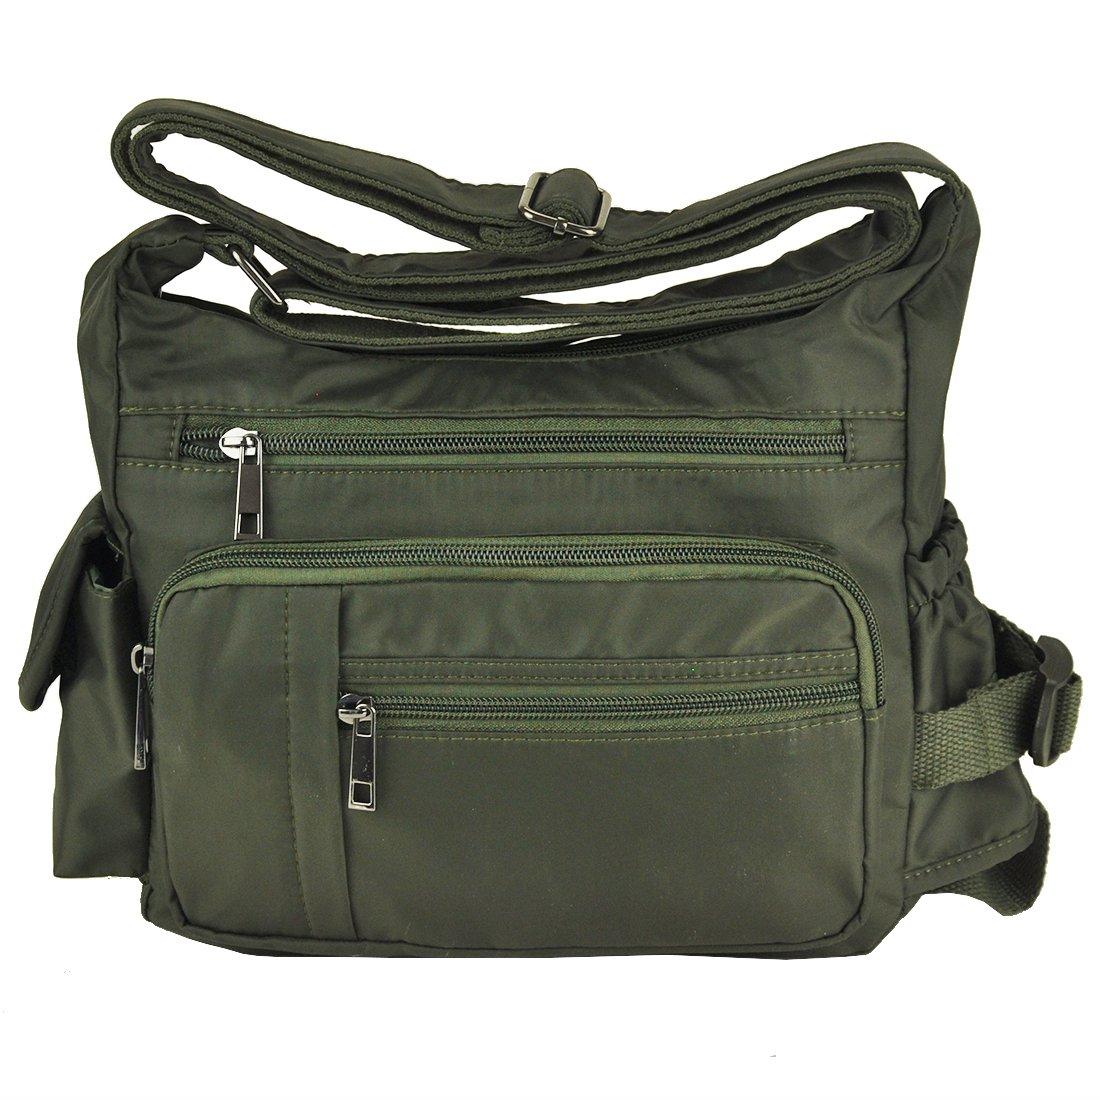 Pocketbooks for Women Lightweight Shoulder Bags Multi Pockets Volcanic Rock Nylon Waterproof Crossbody Handbag